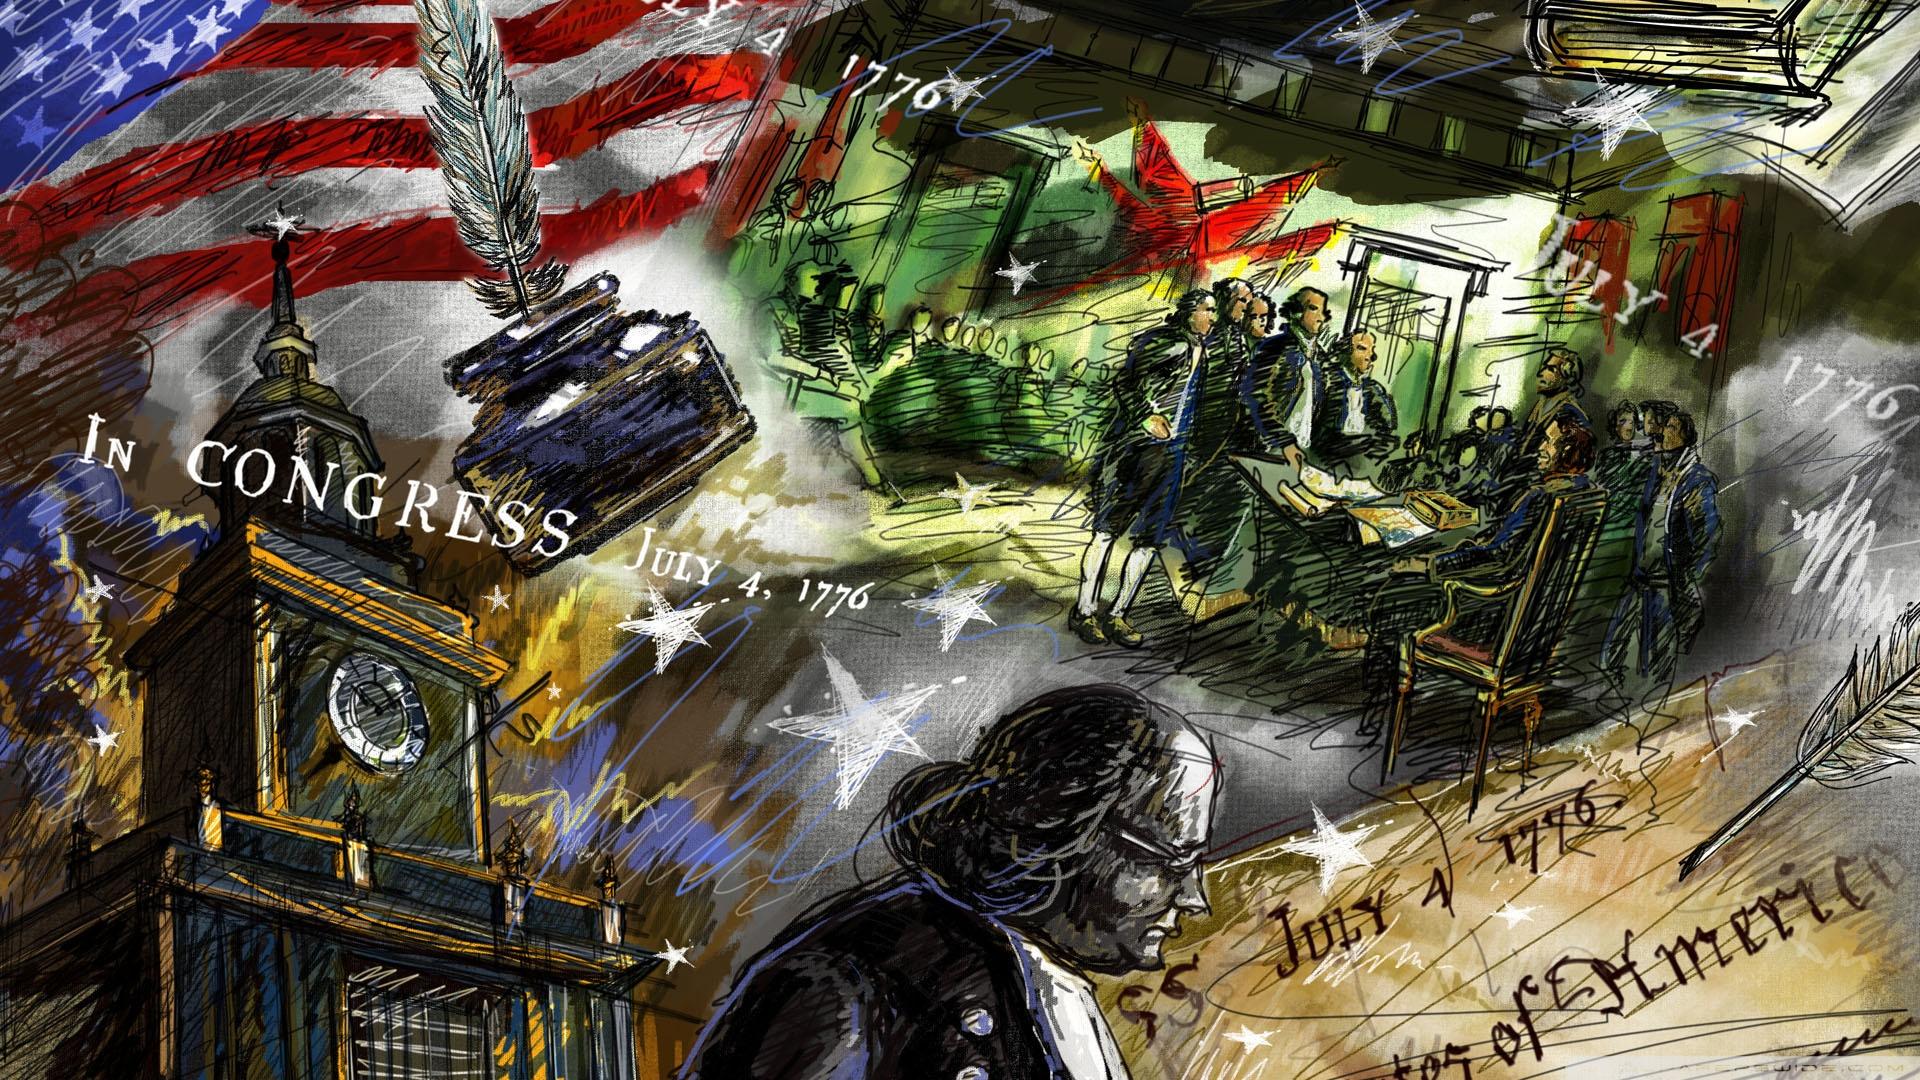 United States Independence Day 4 4K HD Desktop Wallpaper for 4K 1920x1080